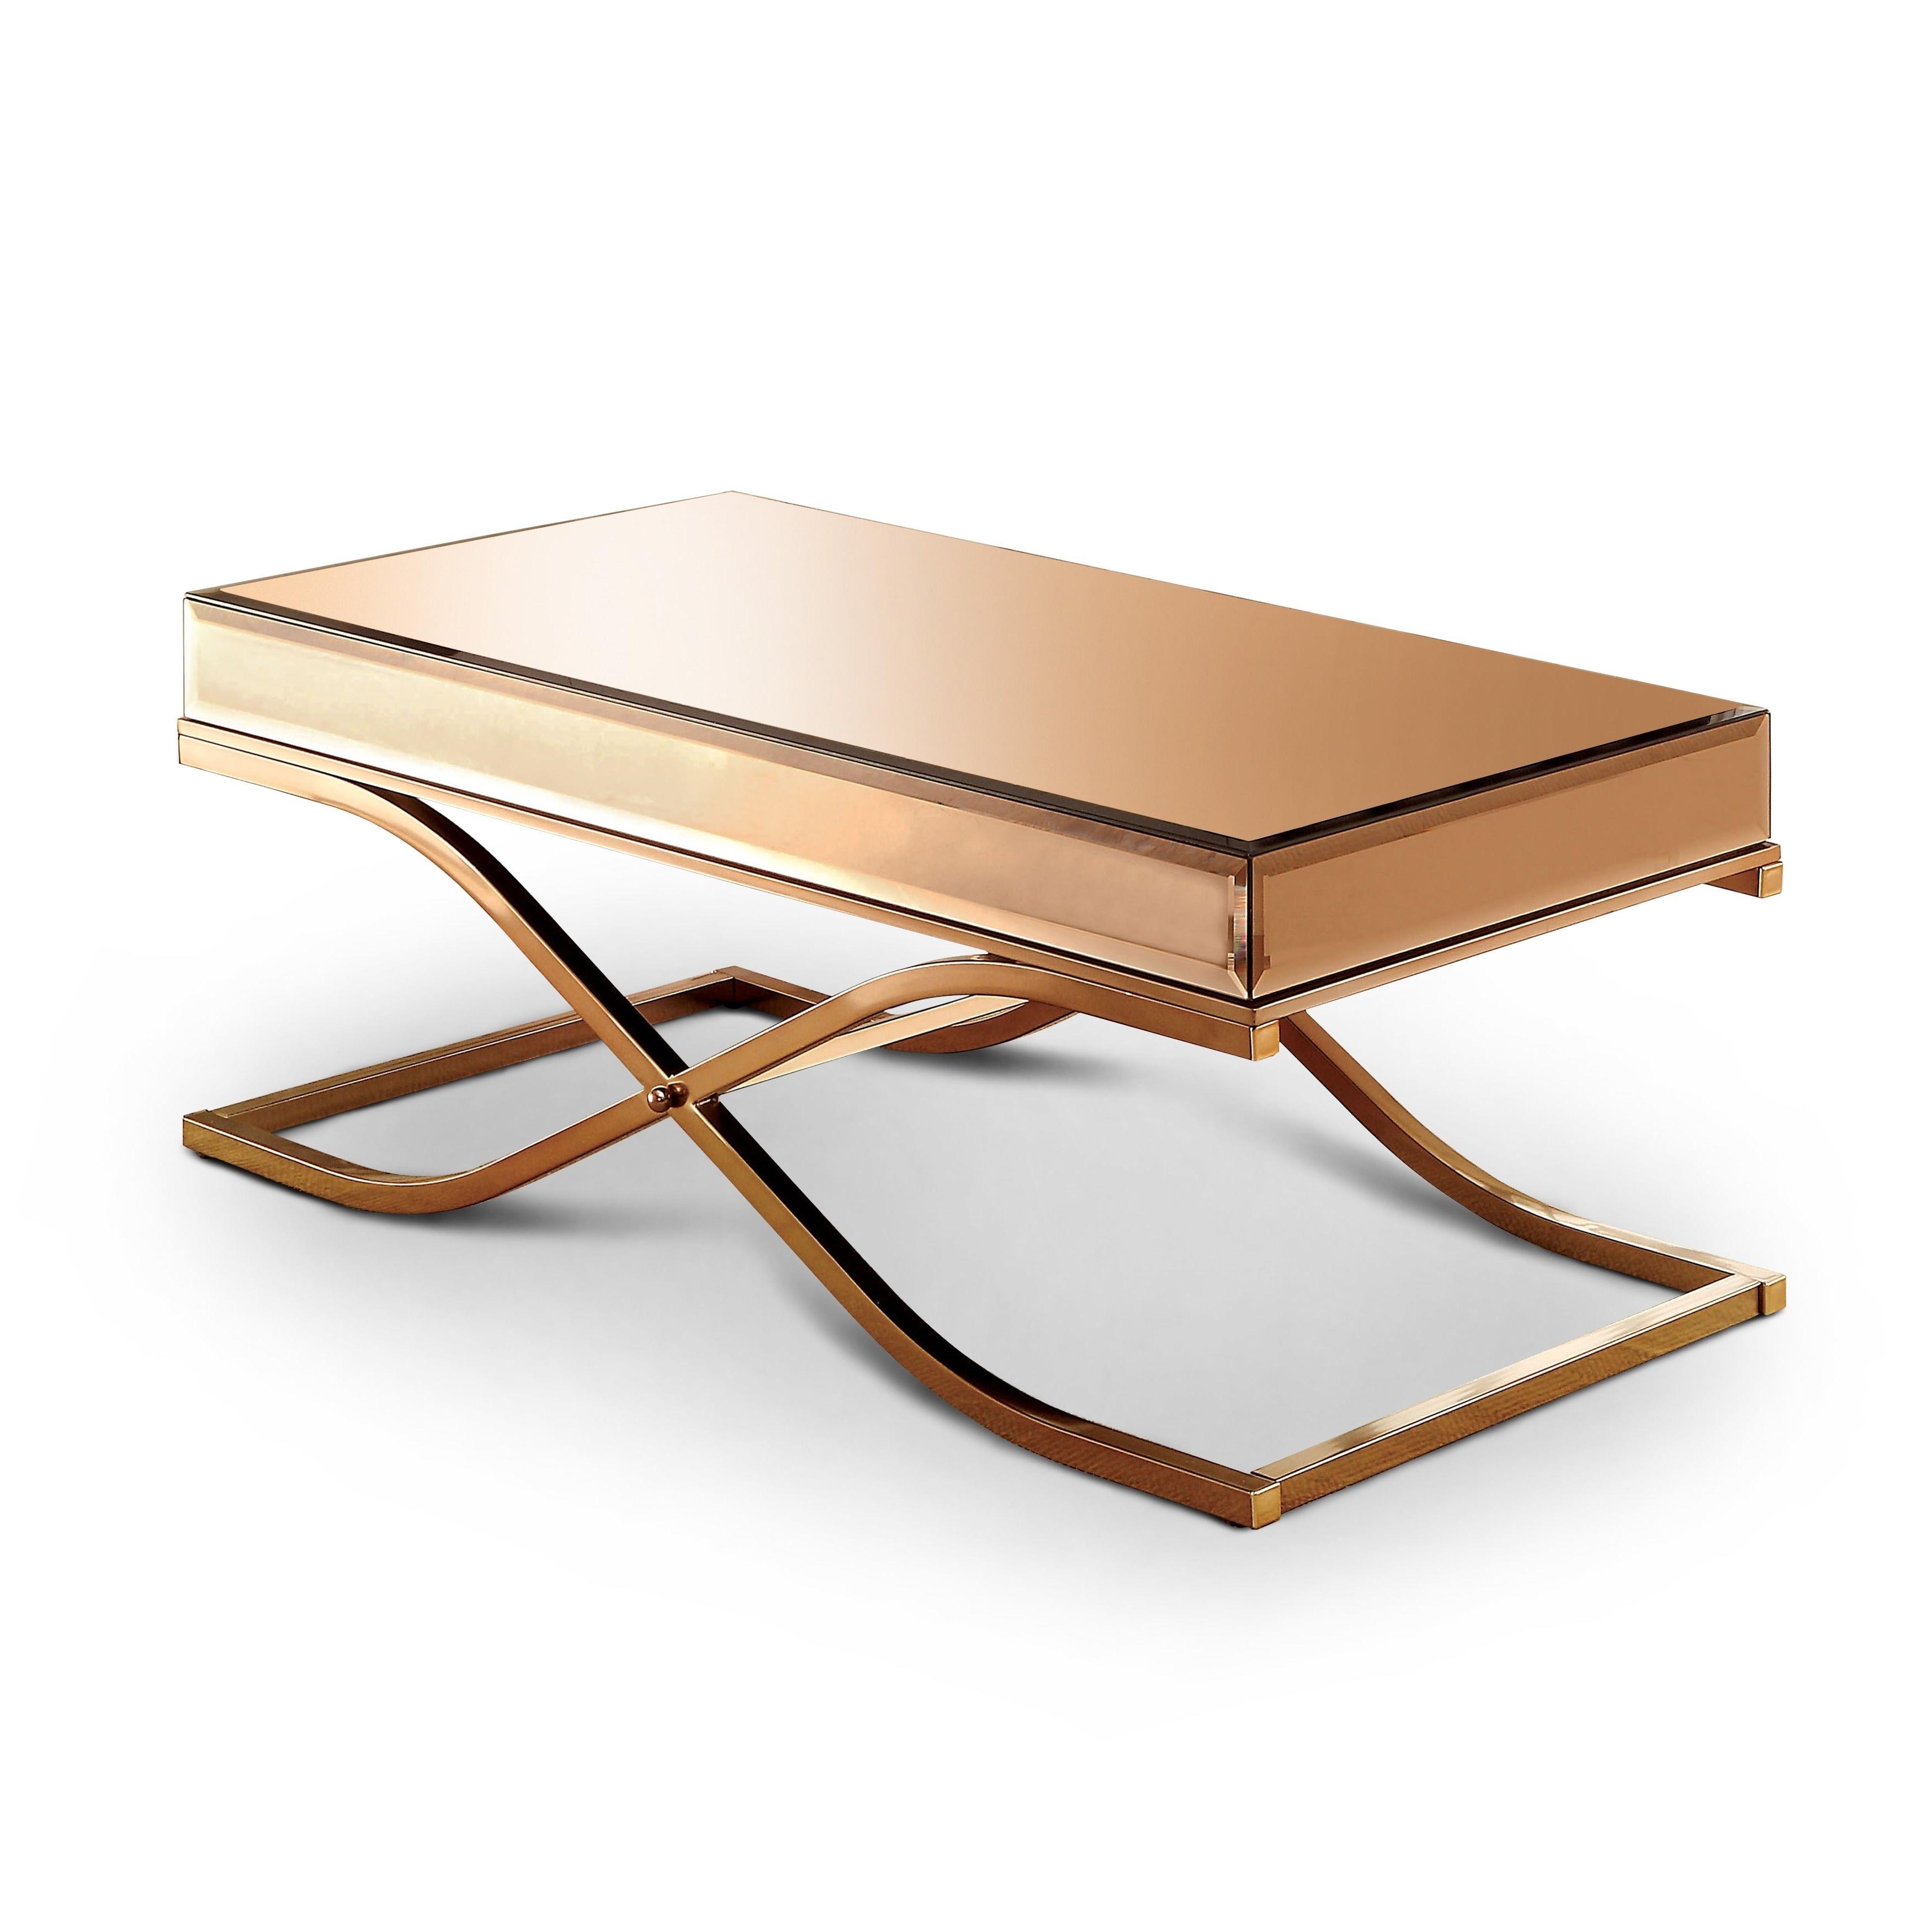 Furniture Of America Orelia Brass Luxury Copper Metal Coffee Table For 2019 Furniture Of America Orelia Brass Luxury Copper Metal Coffee Tables (View 3 of 20)